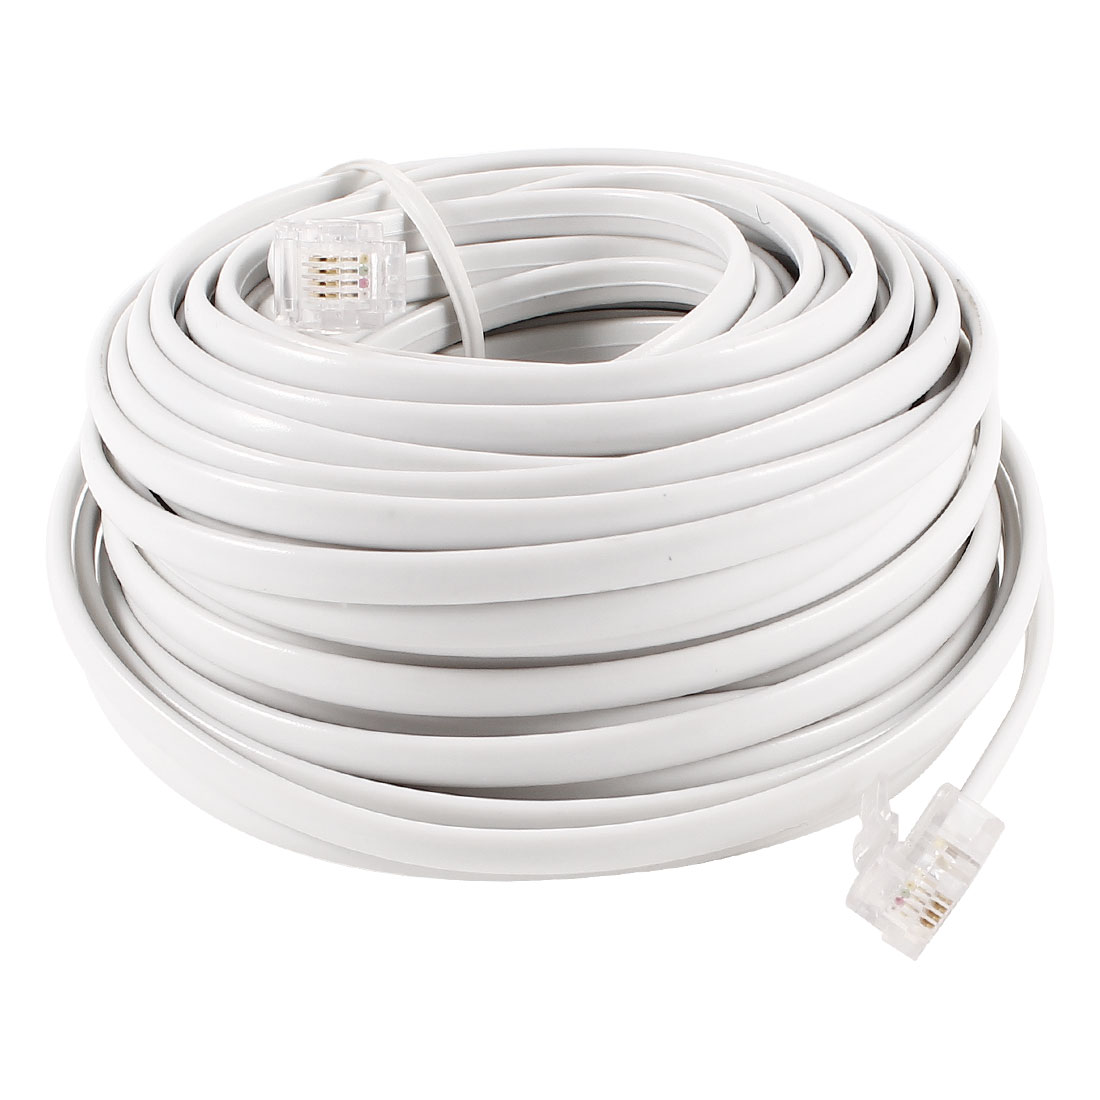 15M 49ft RJ11 6P4C Modular Telephone Phone Cables Cords White